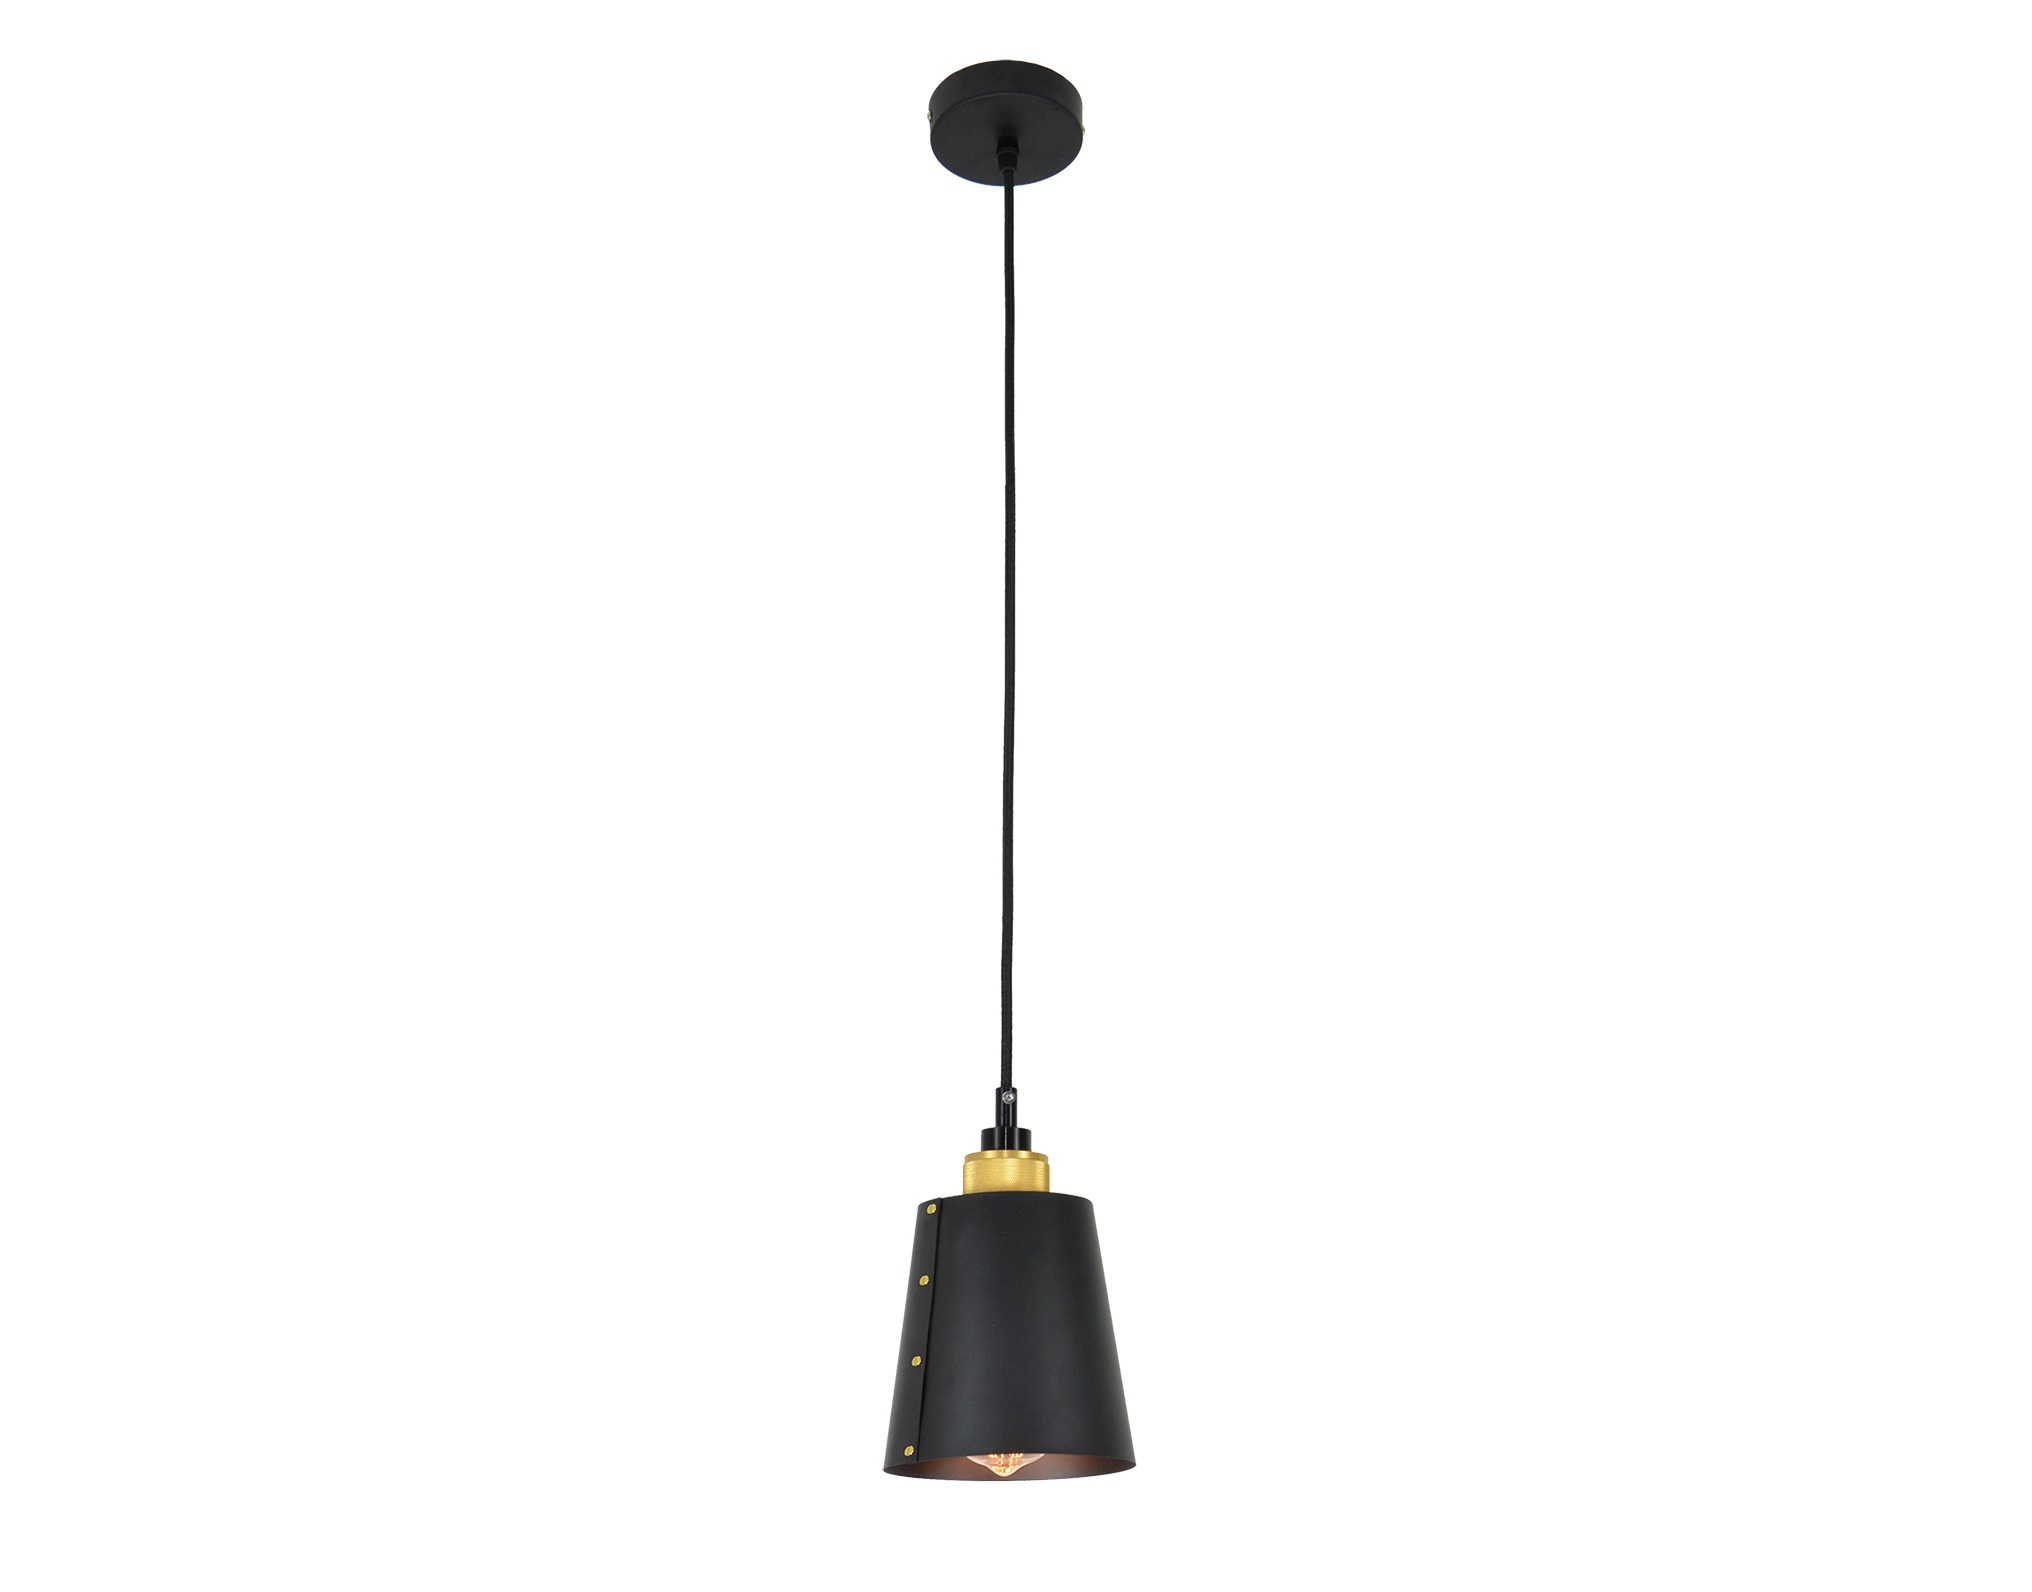 Подвесной светильникПодвесные светильники<br>&amp;lt;div&amp;gt;&amp;lt;div&amp;gt;Вид цоколя: E27&amp;lt;/div&amp;gt;&amp;lt;div&amp;gt;Мощность: 60W&amp;lt;/div&amp;gt;&amp;lt;div&amp;gt;Количество ламп: 1&amp;lt;/div&amp;gt;&amp;lt;div&amp;gt;Наличие ламп: отсутствуют.&amp;lt;/div&amp;gt;&amp;lt;/div&amp;gt;<br><br>Material: Металл<br>Высота см: 140